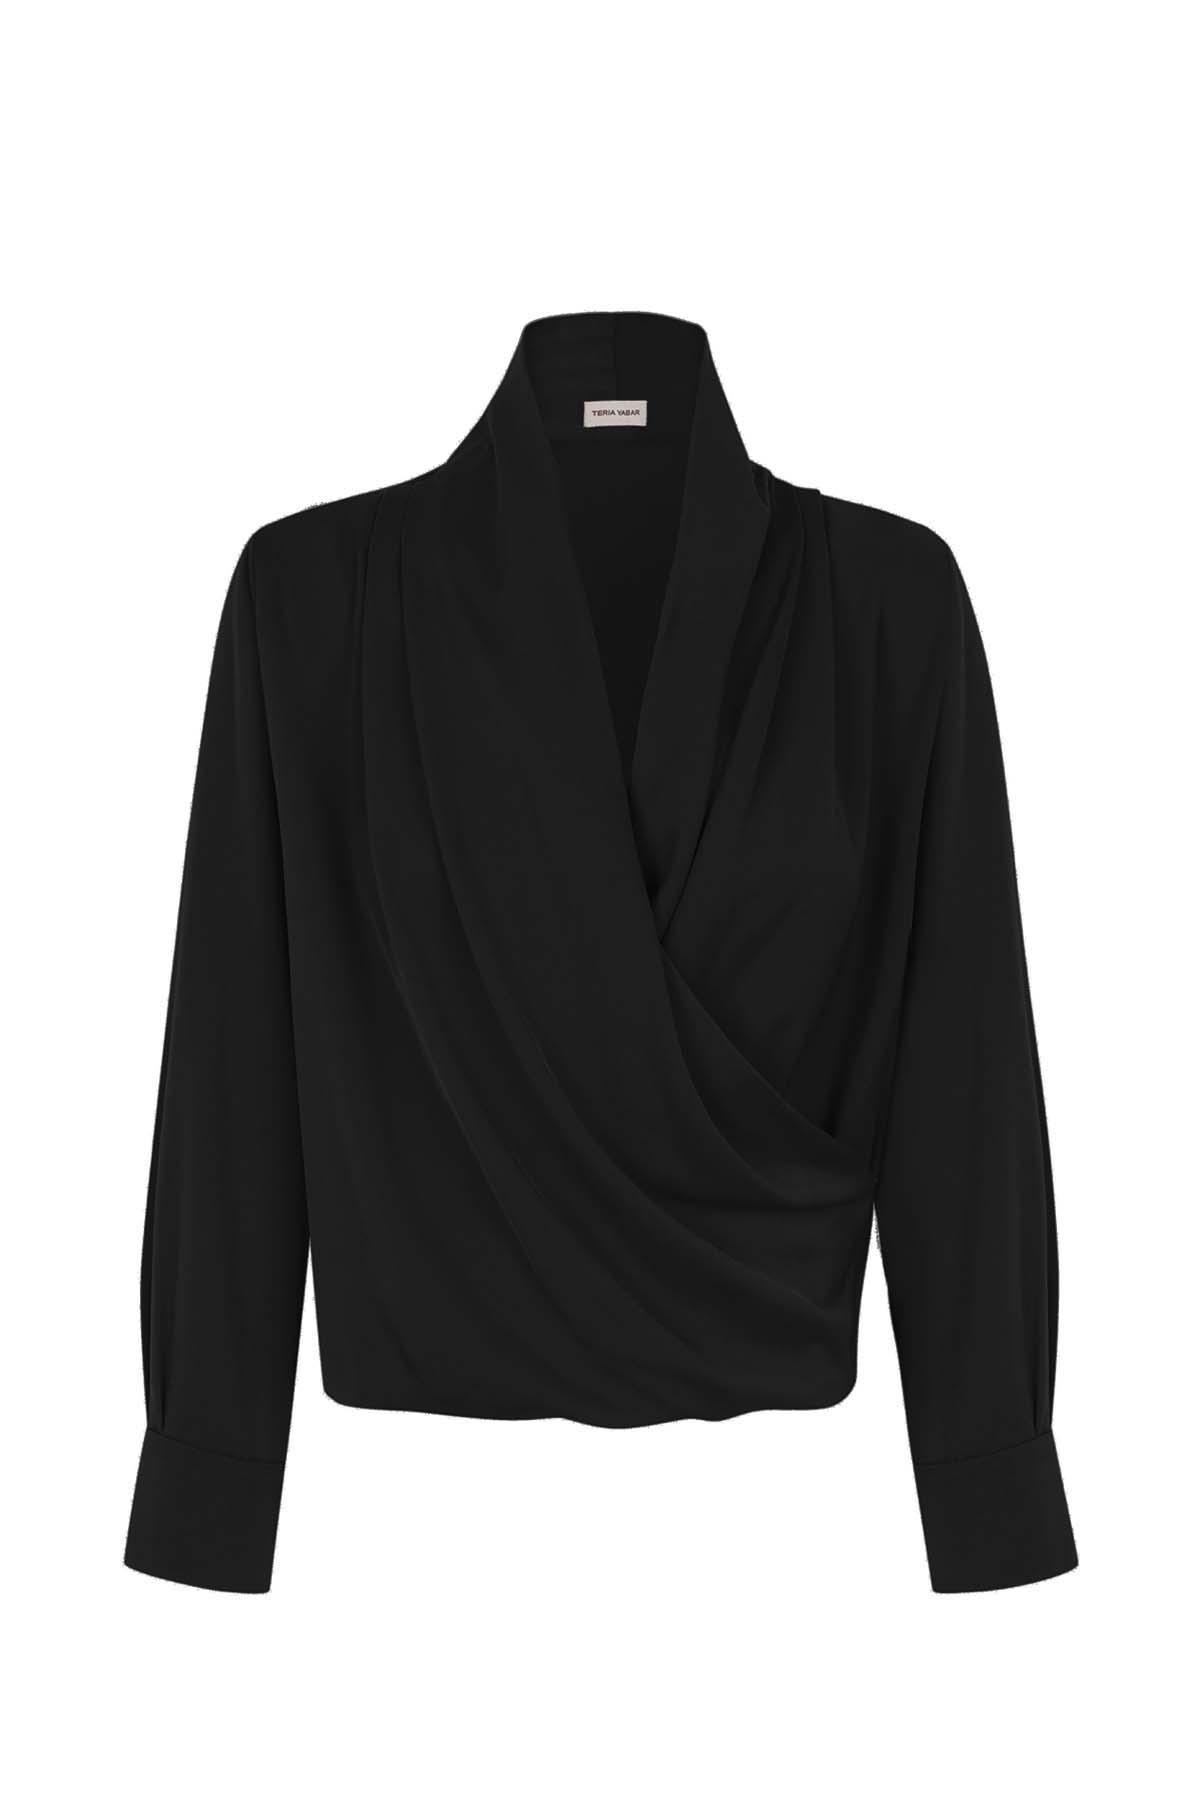 Teria Yabar - Camisa Passy noir